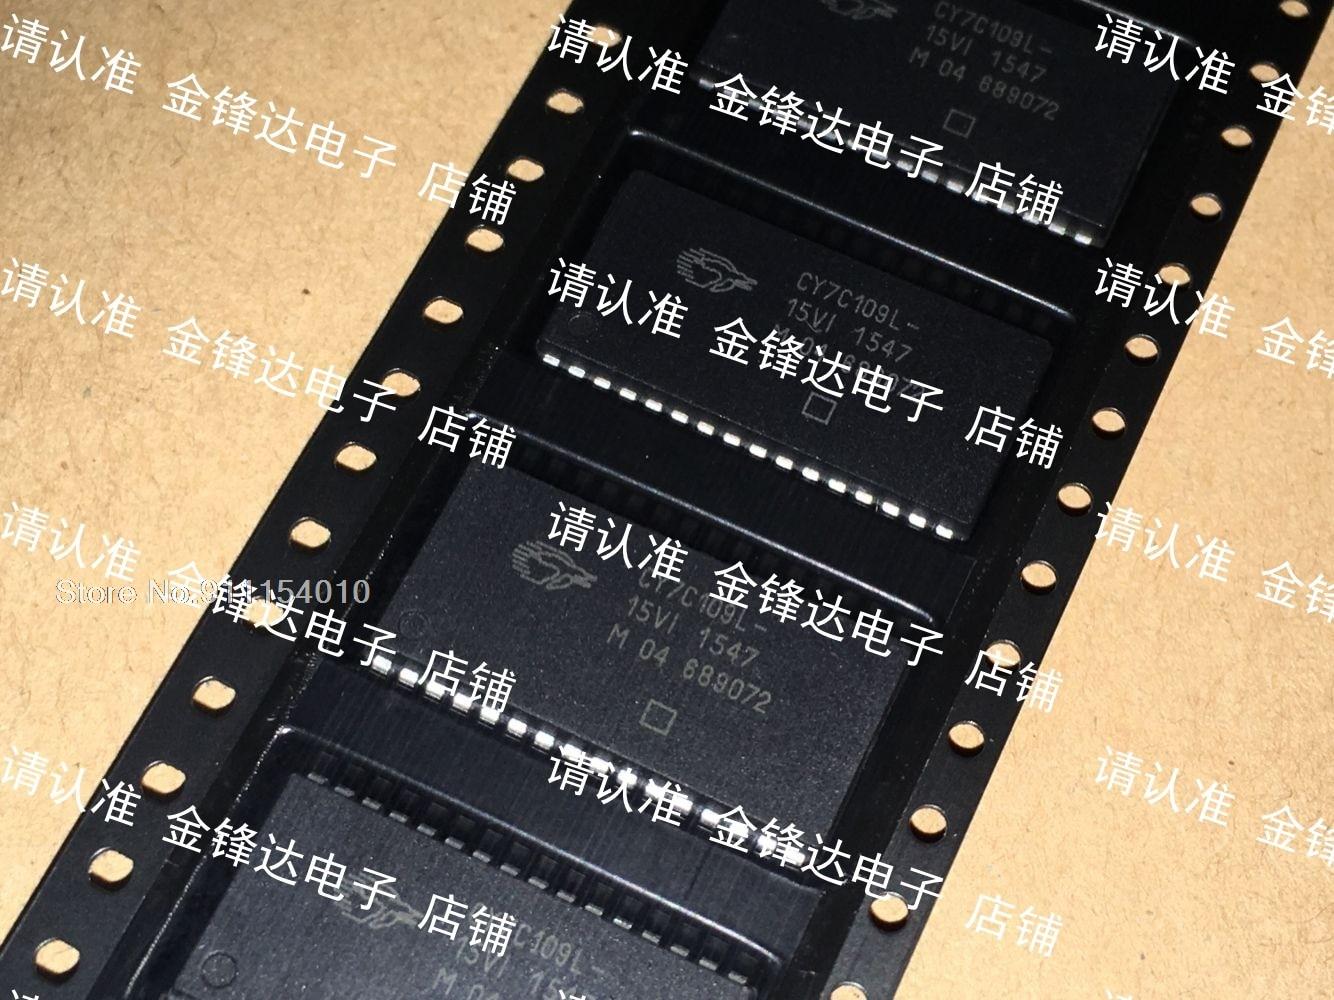 CY7C109D-10VXI / B-15VI / B-15VXC / BN-15VI / L-15VI